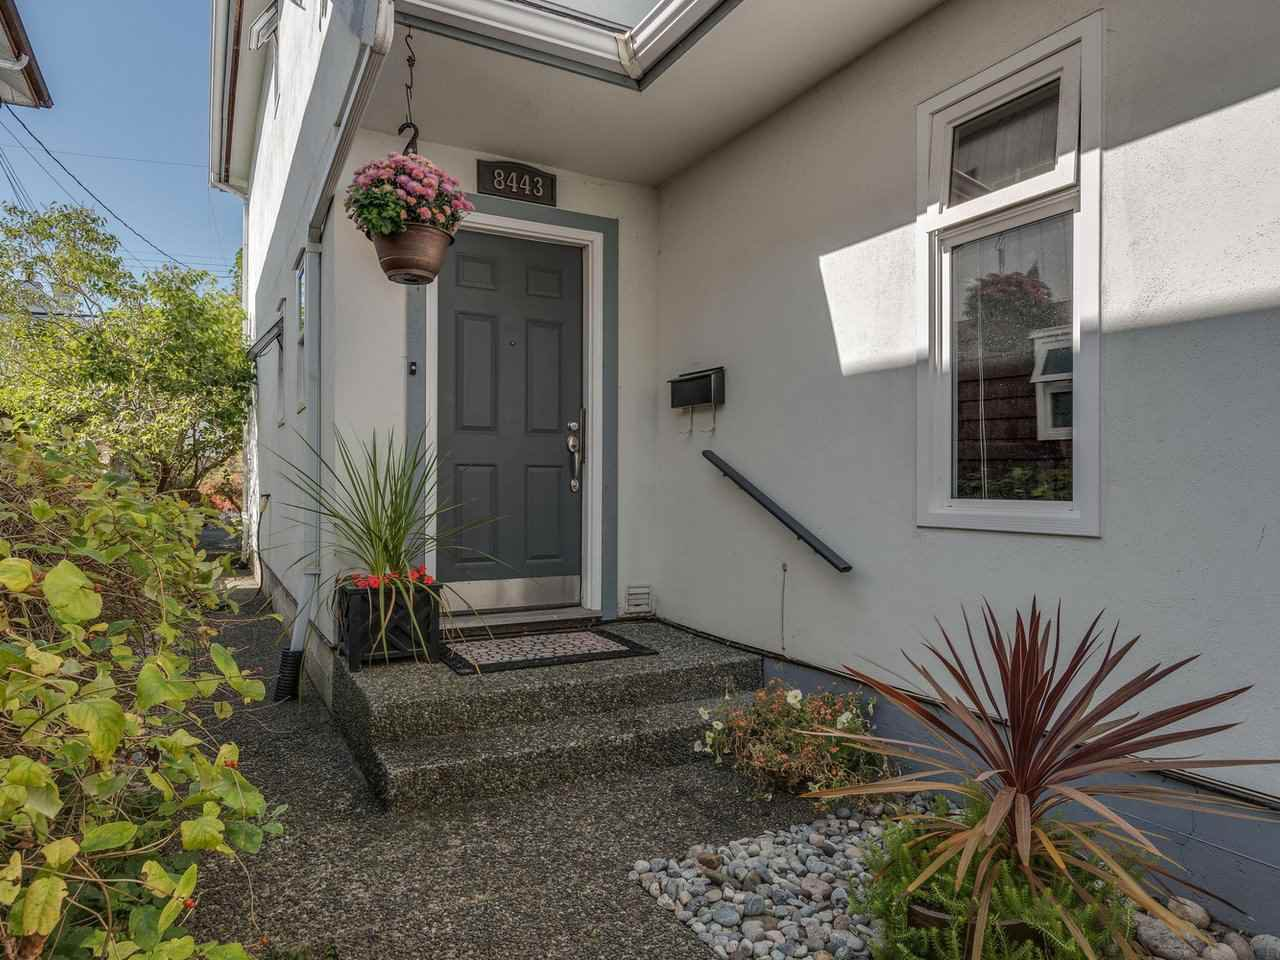 "Main Photo: 8443 LAUREL Street in Vancouver: Marpole 1/2 Duplex for sale in ""MARPOLE"" (Vancouver West)  : MLS®# R2403493"